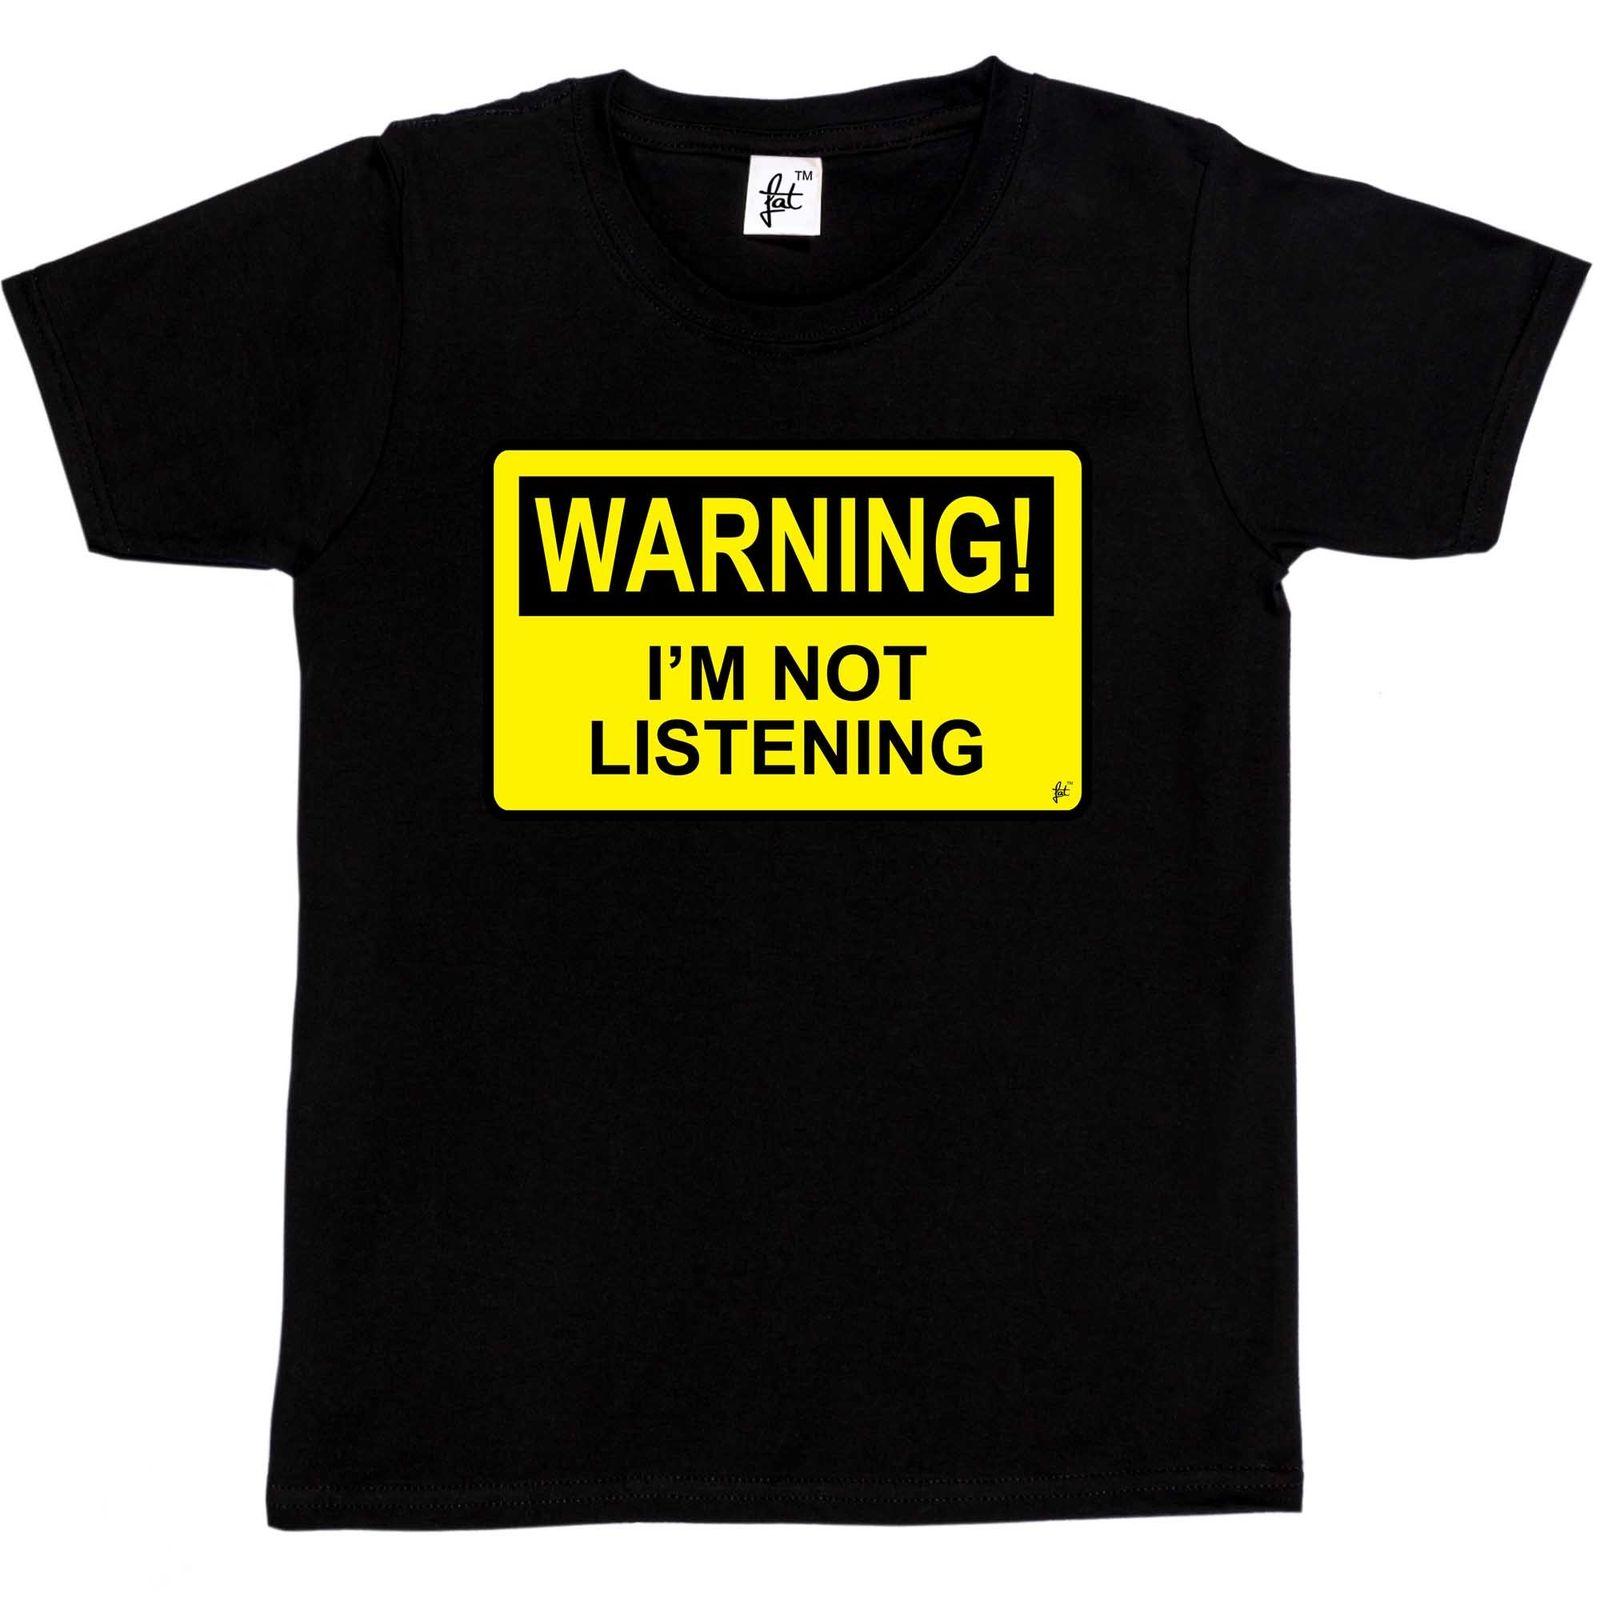 Warning I'm Not Listening Danger Fun Humour Kids Boys  Girls T-Shirt